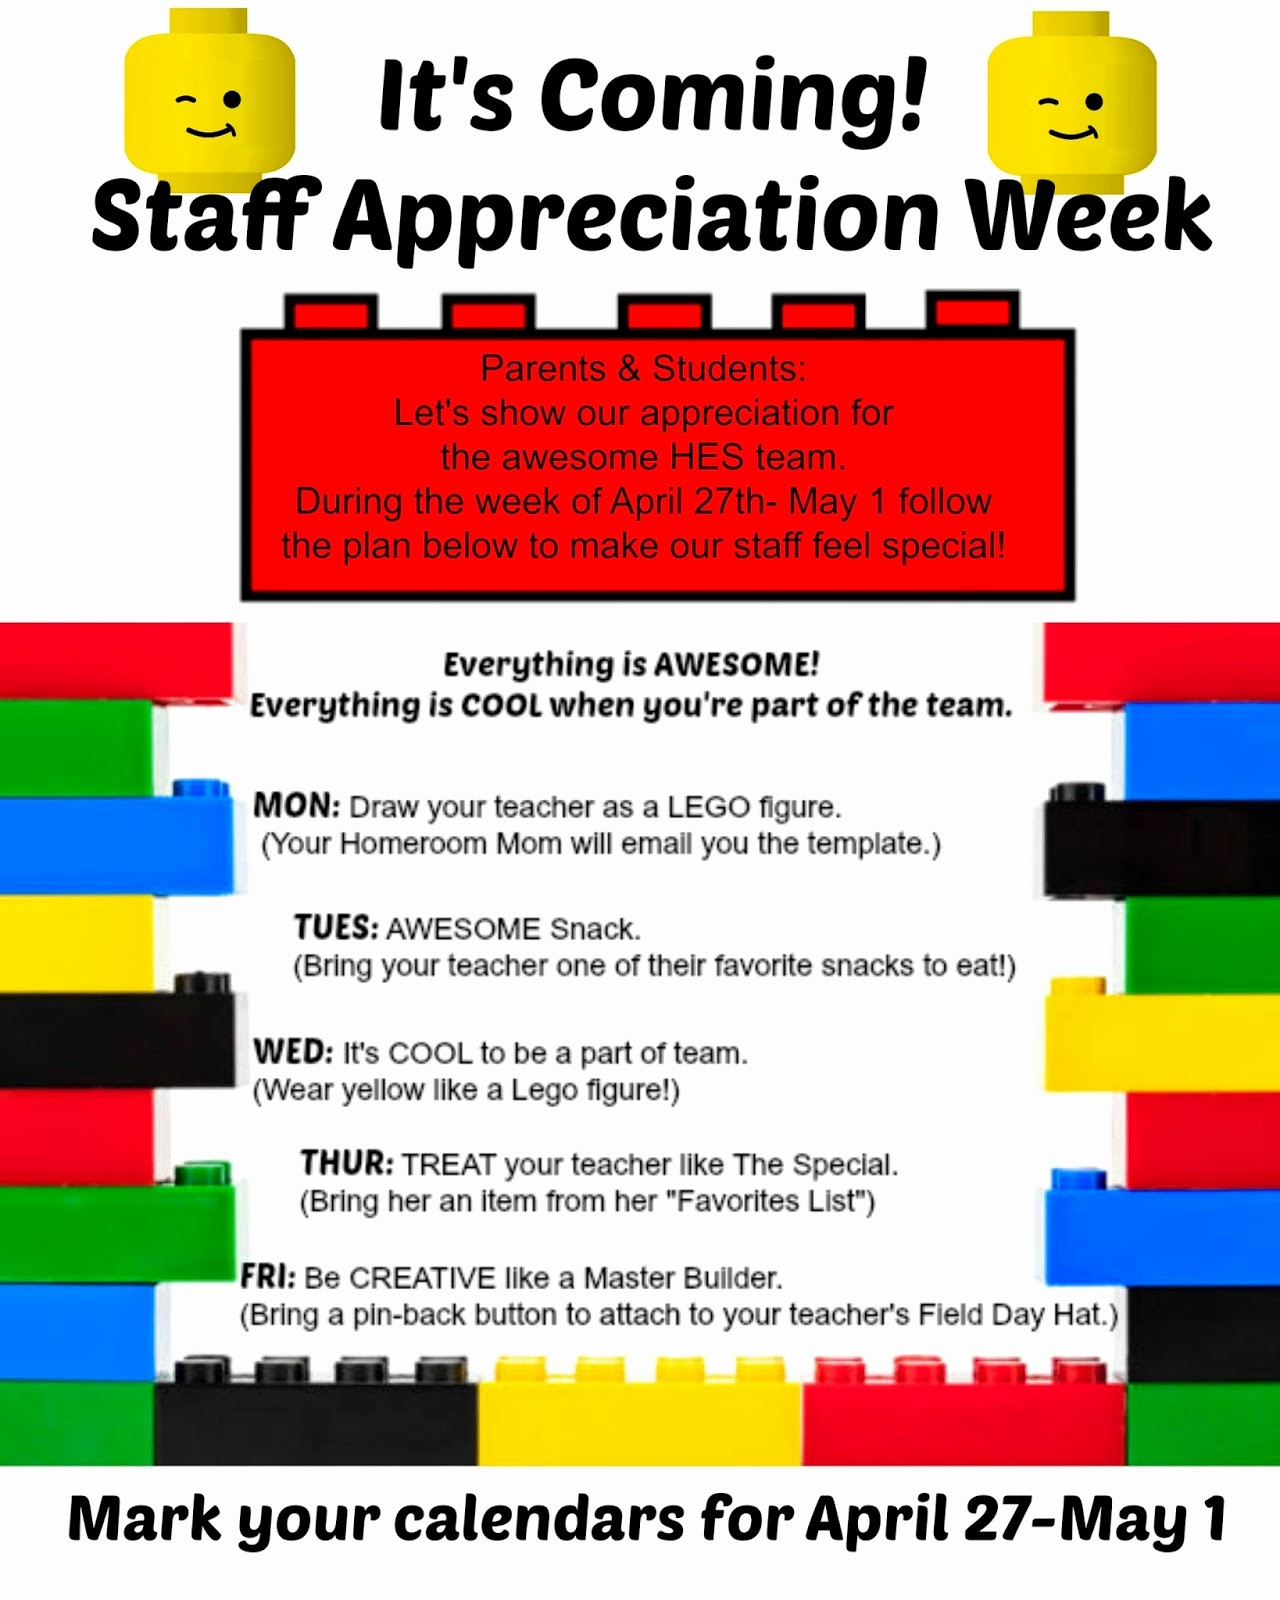 Employee Appreciation Day Flyer Template Awesome Crafty Texas Girls Staff Appreciation Lego theme